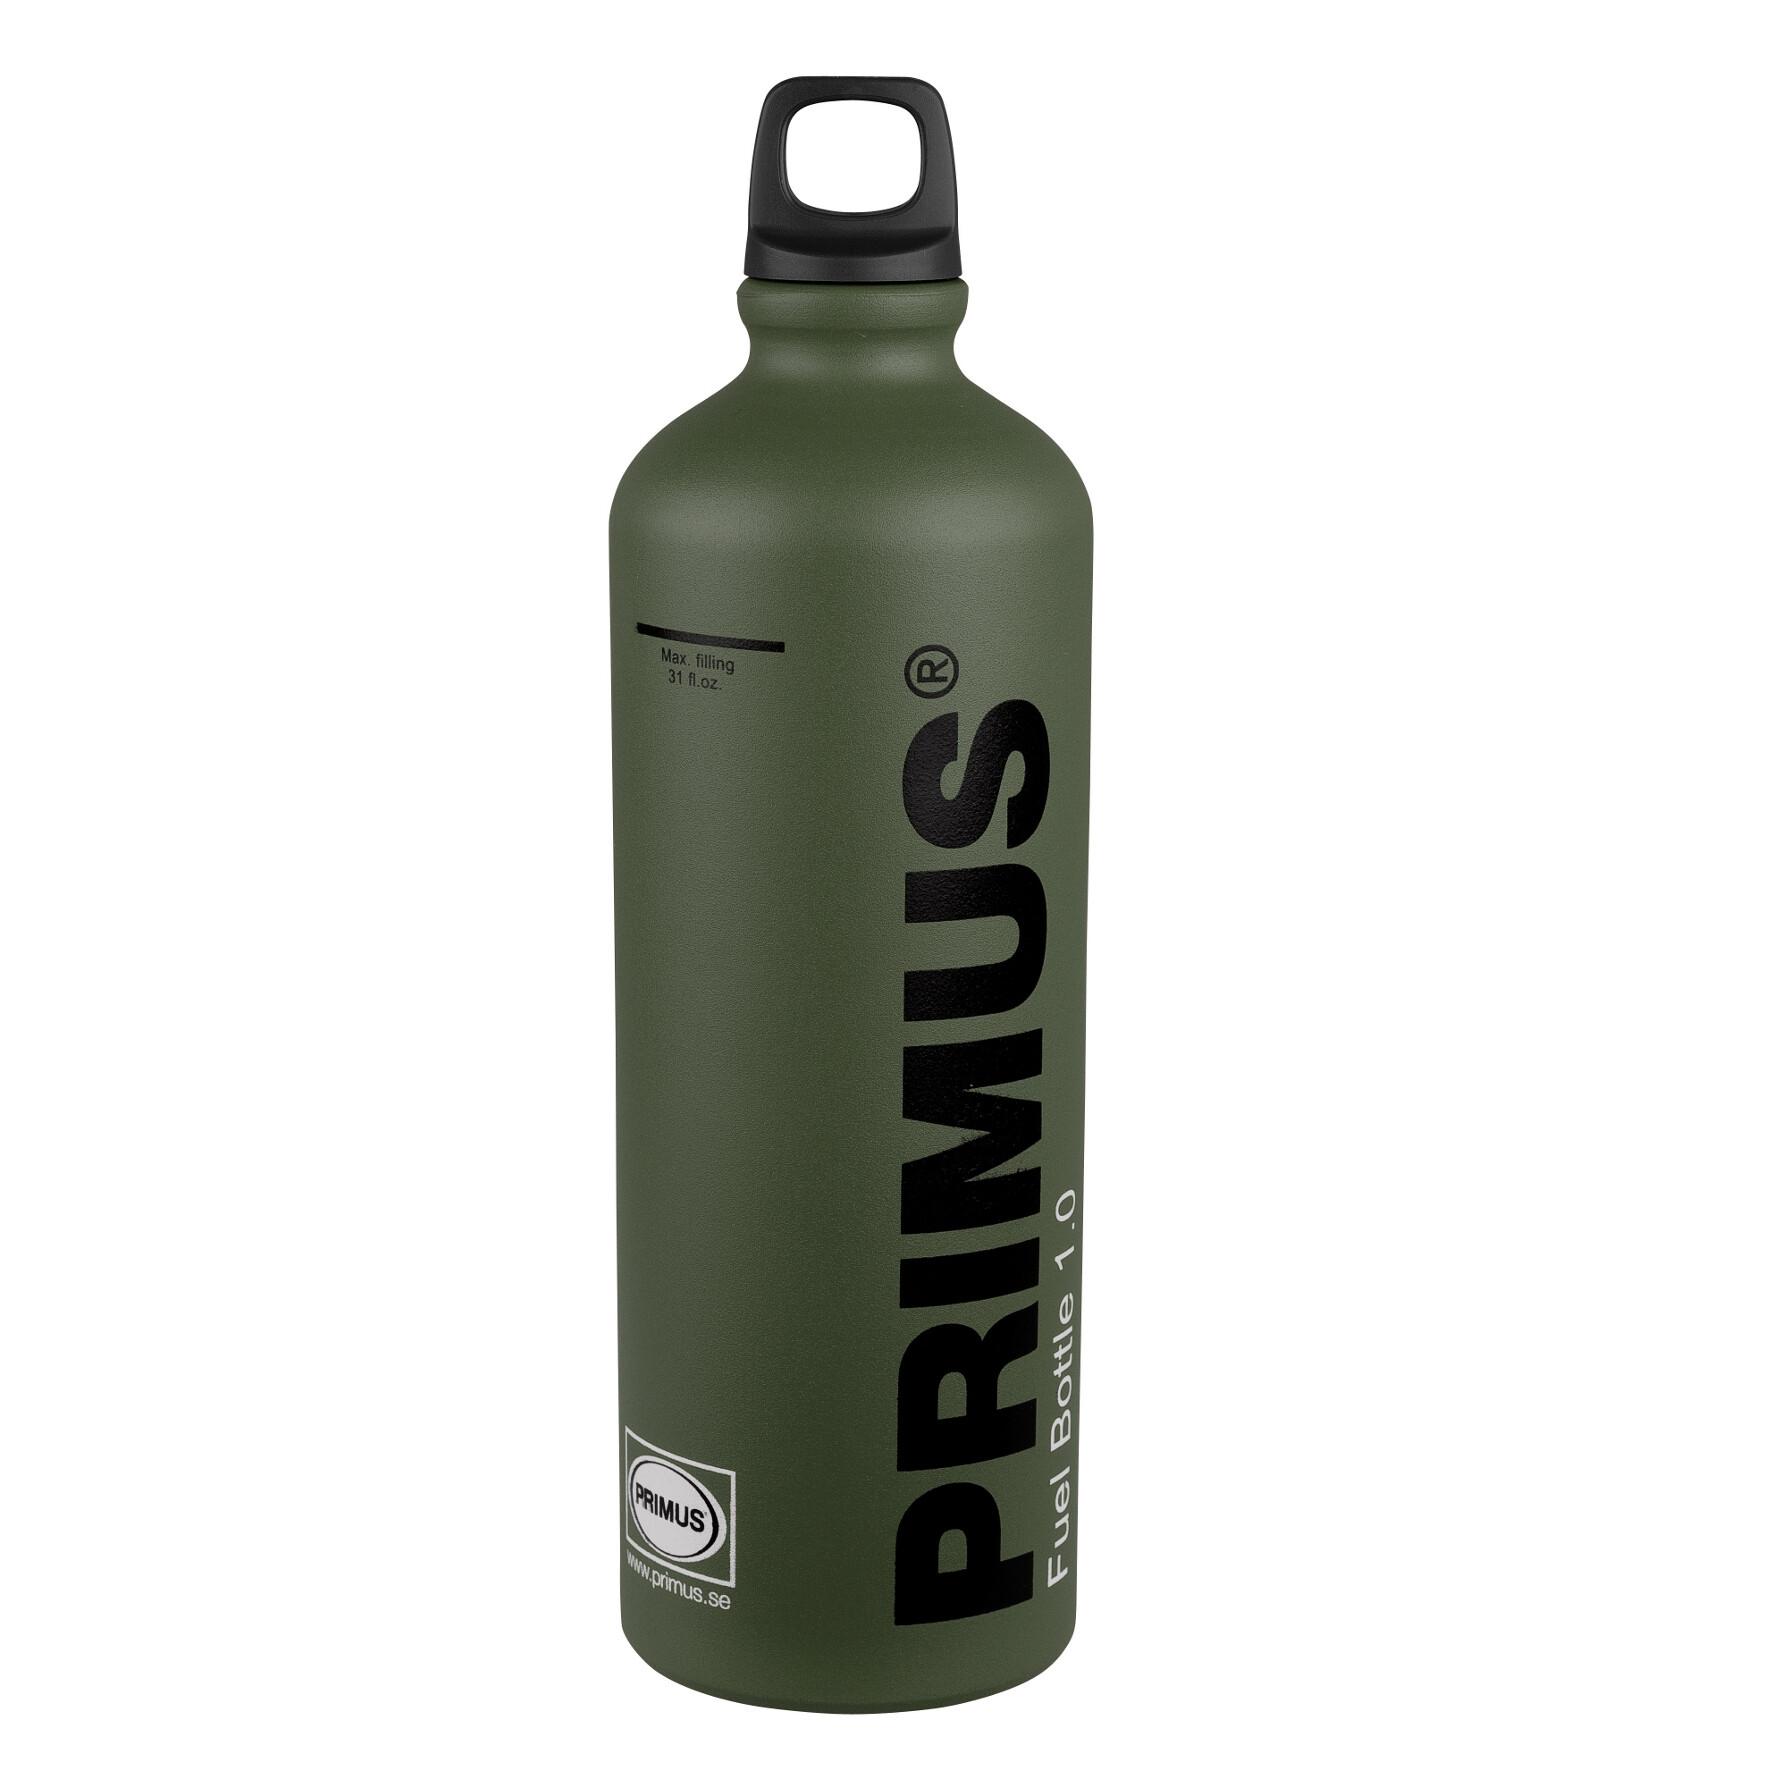 Primus Fuel Bottle 1000ml, forest green (2019) | Bottles